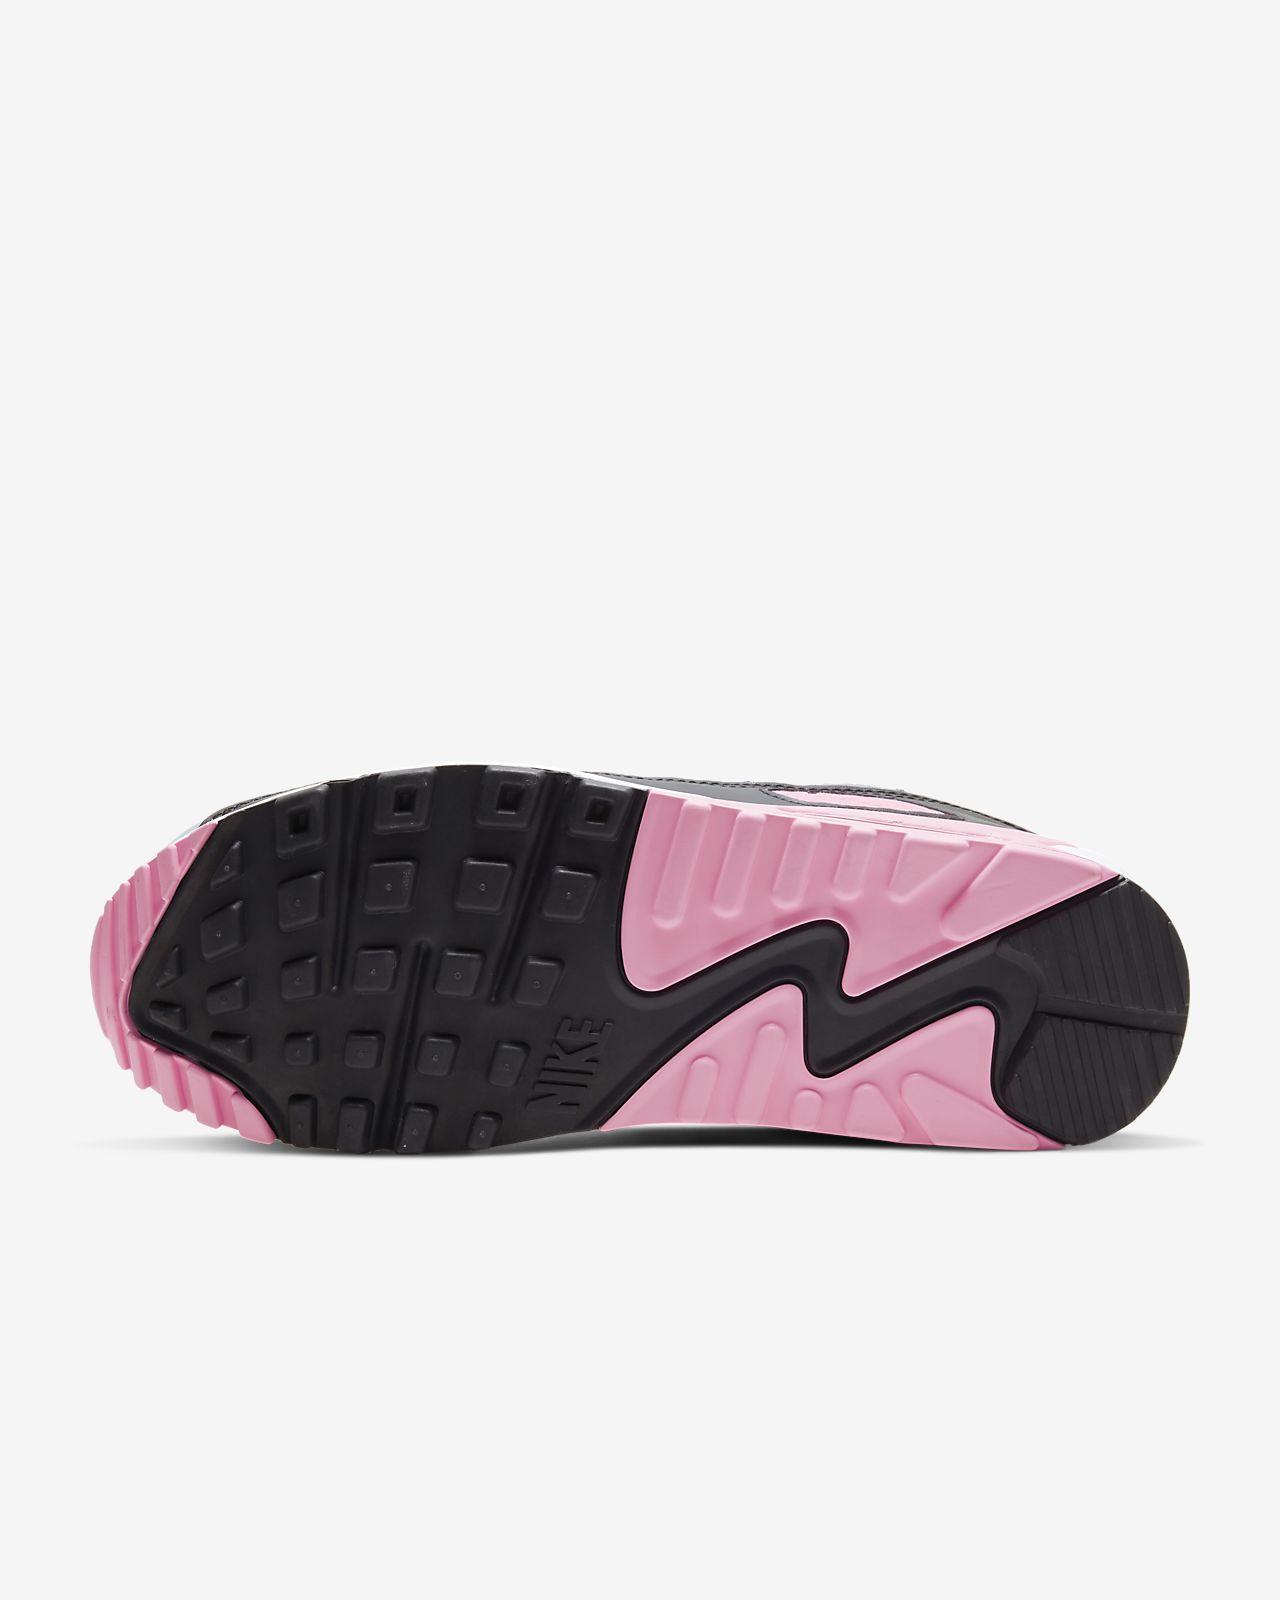 NIKE AIR MAX 90 ULTRA 819474600   Rot   79,99 €   Sneaker   ✪ ✪